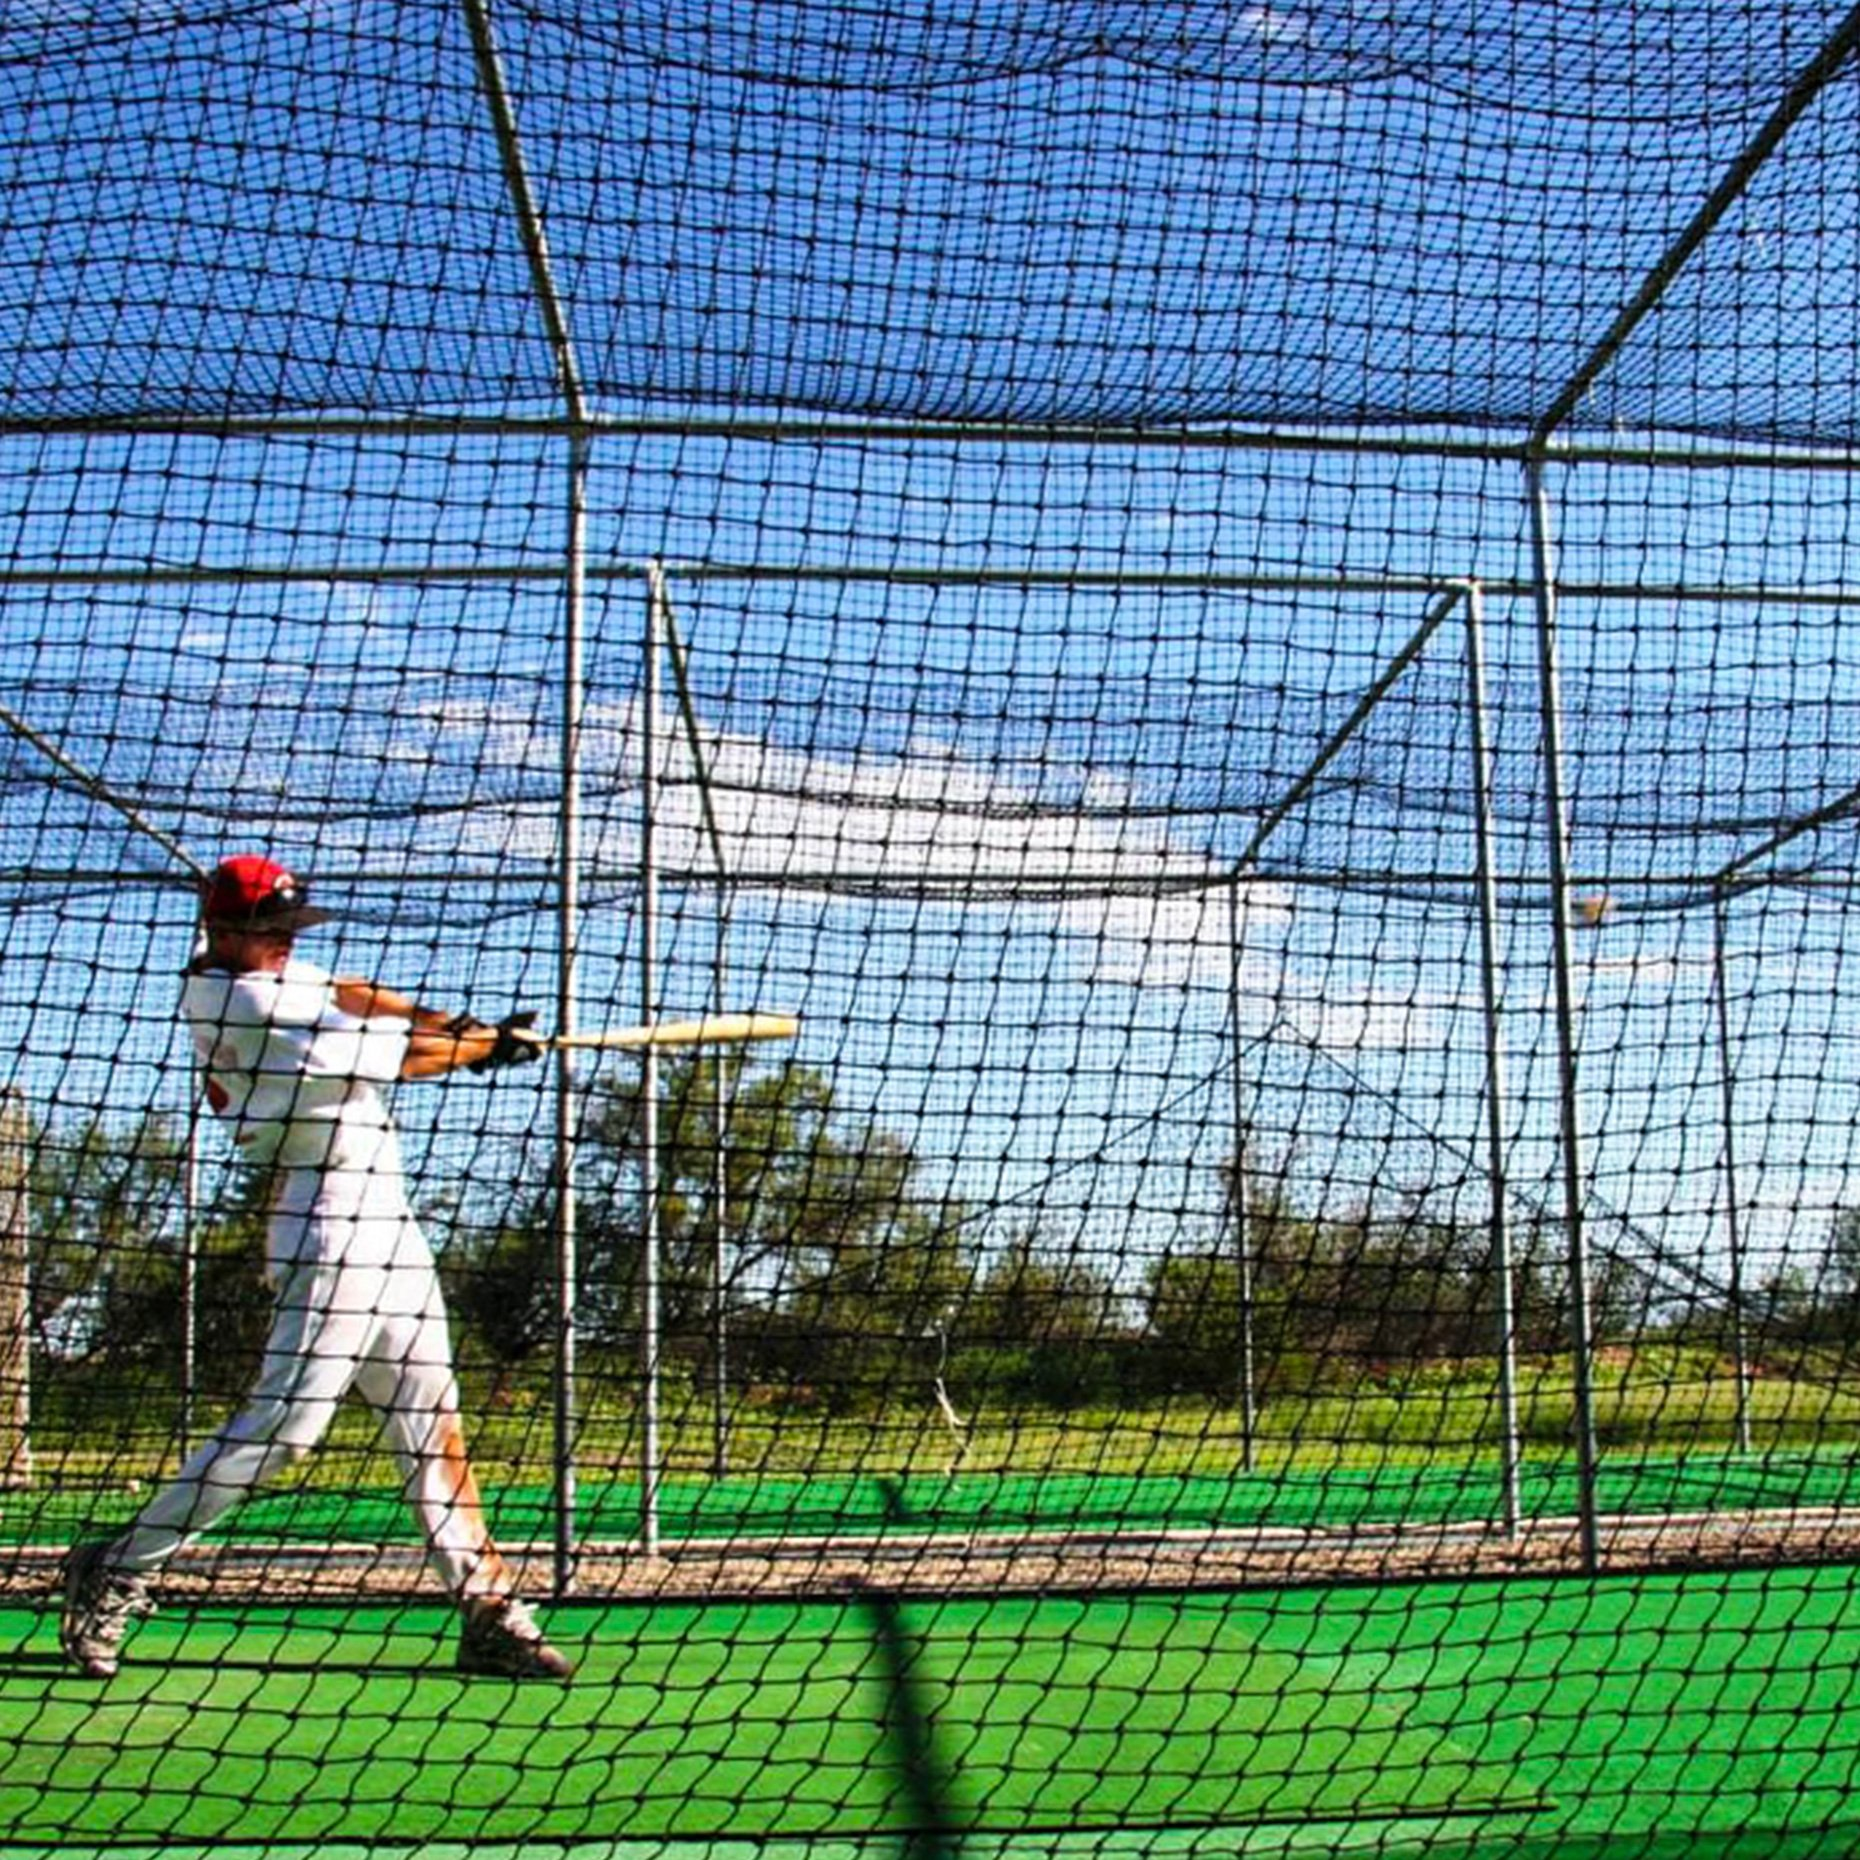 Baseball Batting Cage Nets [12 Sizes] | Professional Fully Enclosed #42 Grade Heavy Duty HDPP Netting | Baseball & Softball Cage Netting | Hitting Cage Net